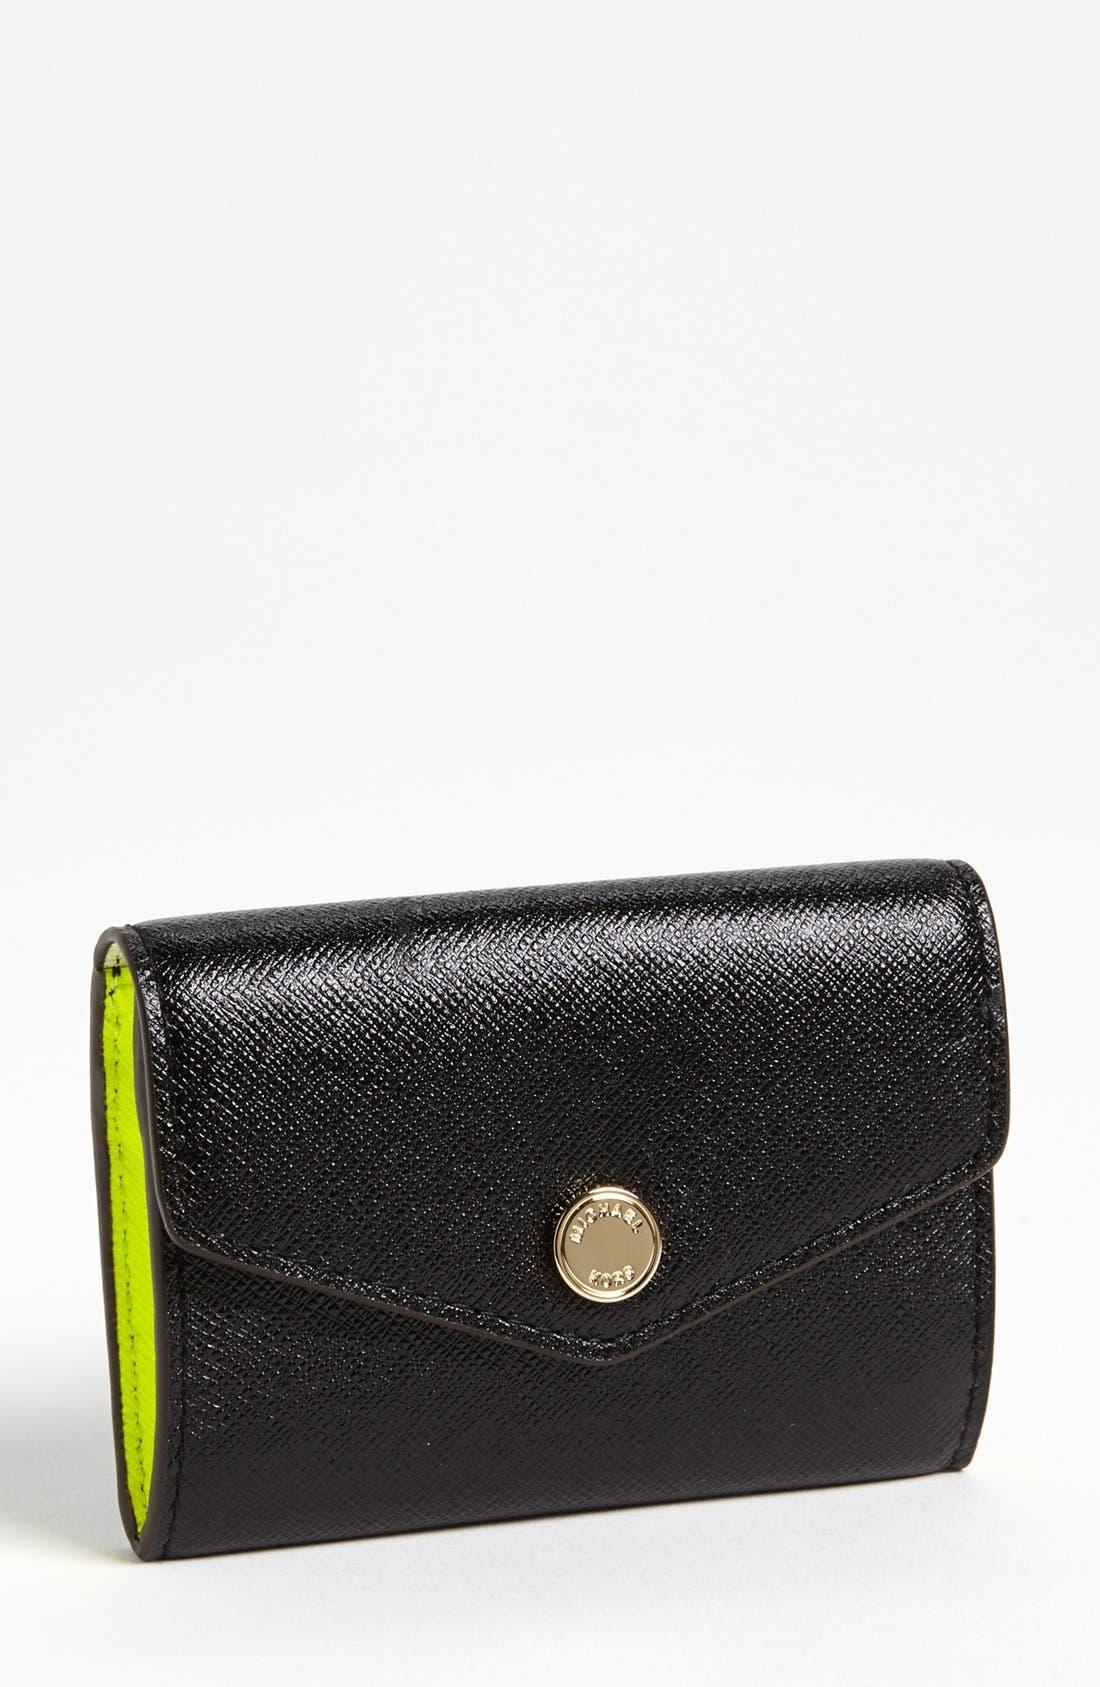 Main Image - MICHAEL Michael Kors Saffiano Leather Coin Purse